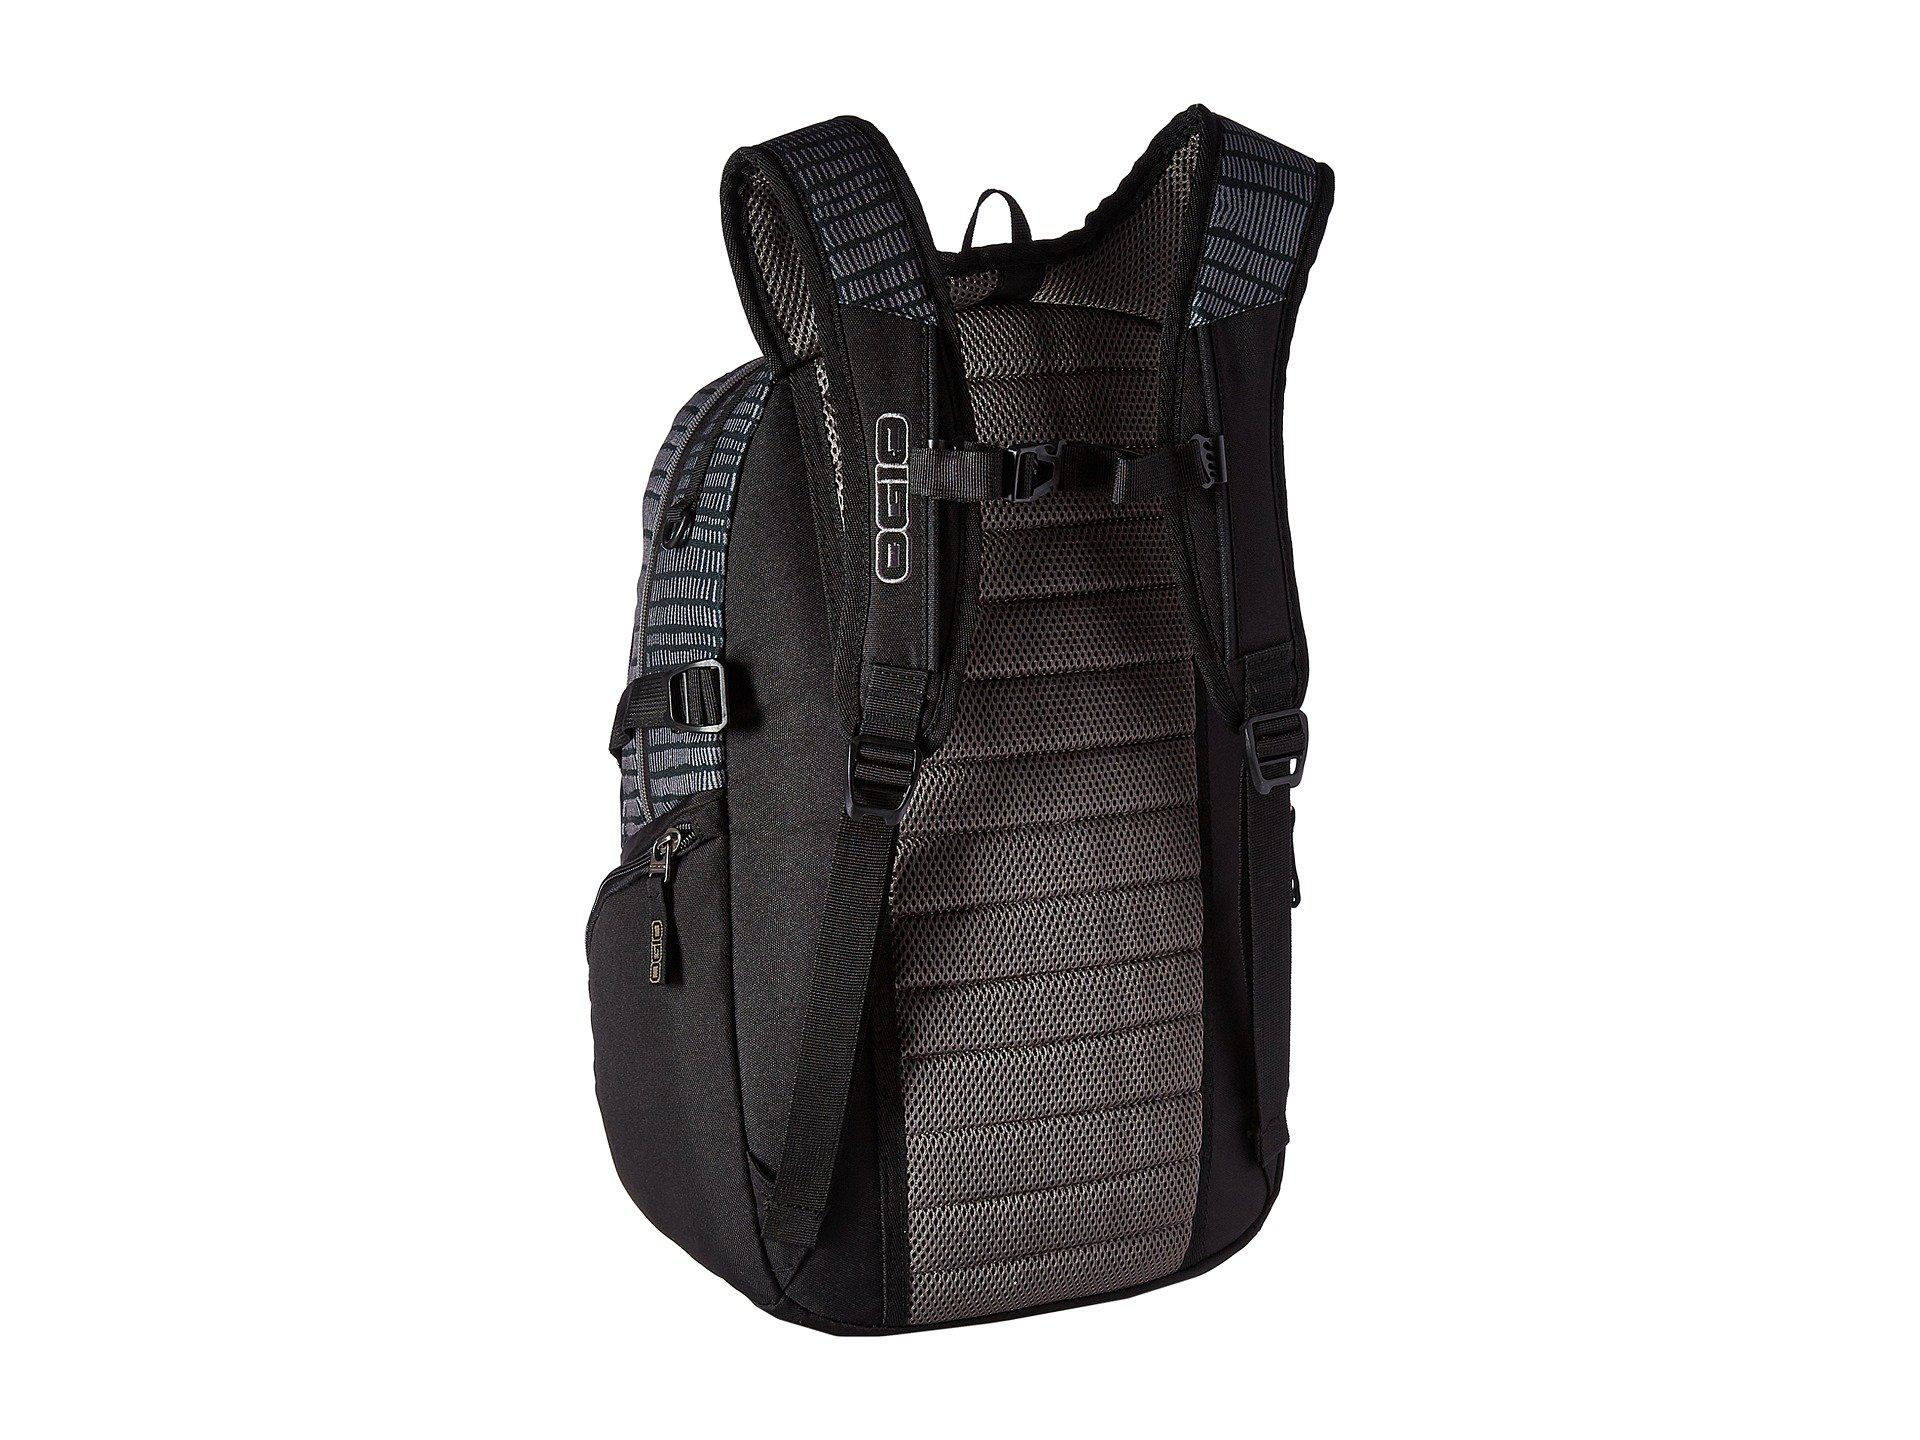 Lyst - Ogio Quad Pack in Black for Men